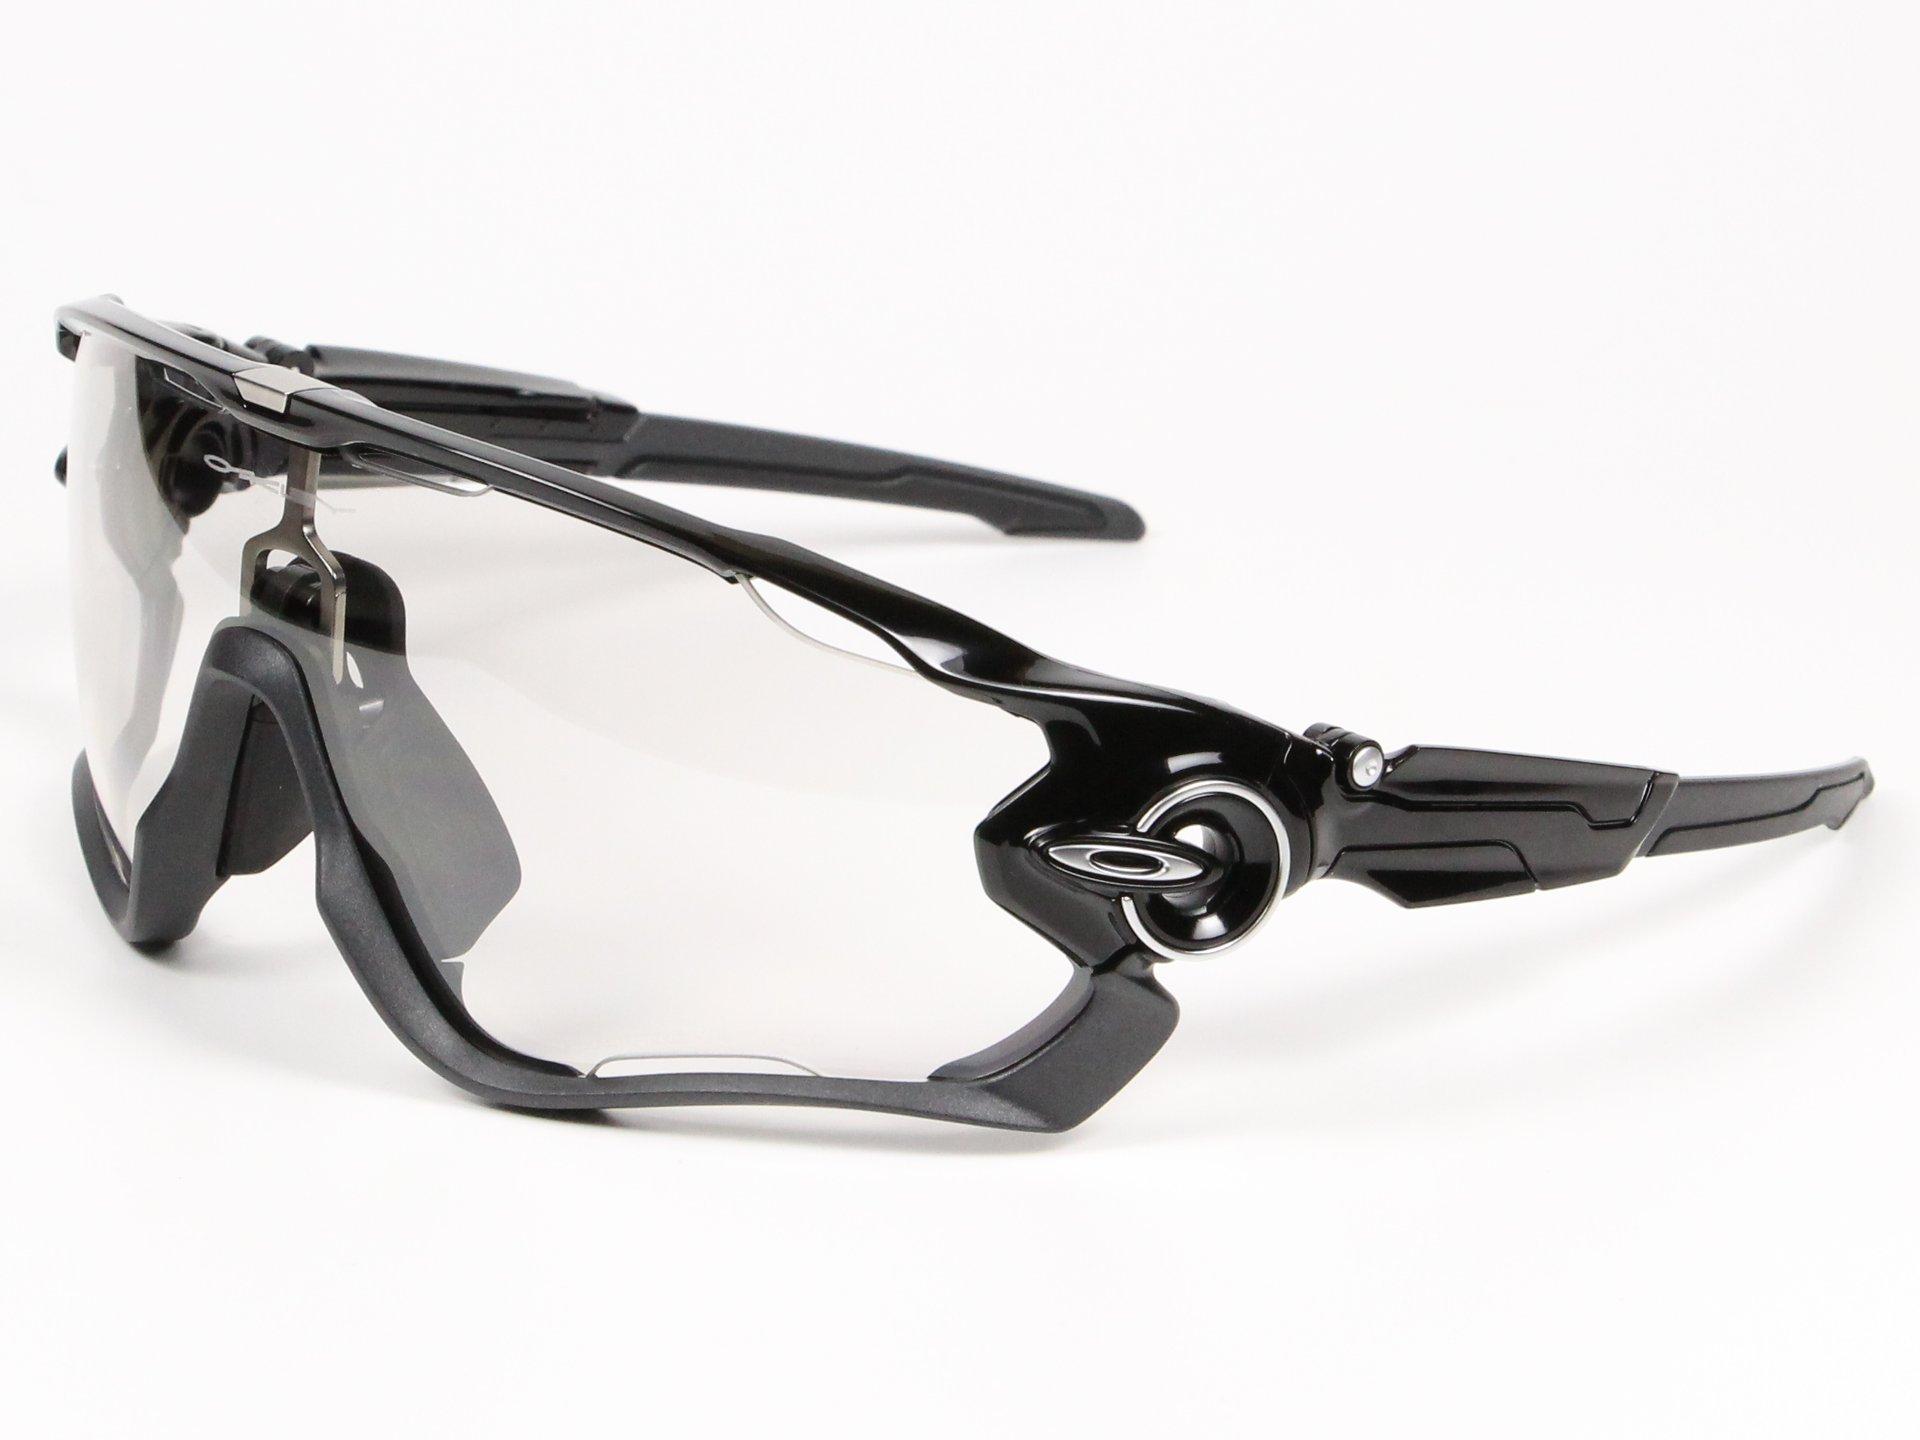 OAKLEY JAWBREAKER(オークリー・ジョウブレイカー) 調光レンズモデル OO9290-14